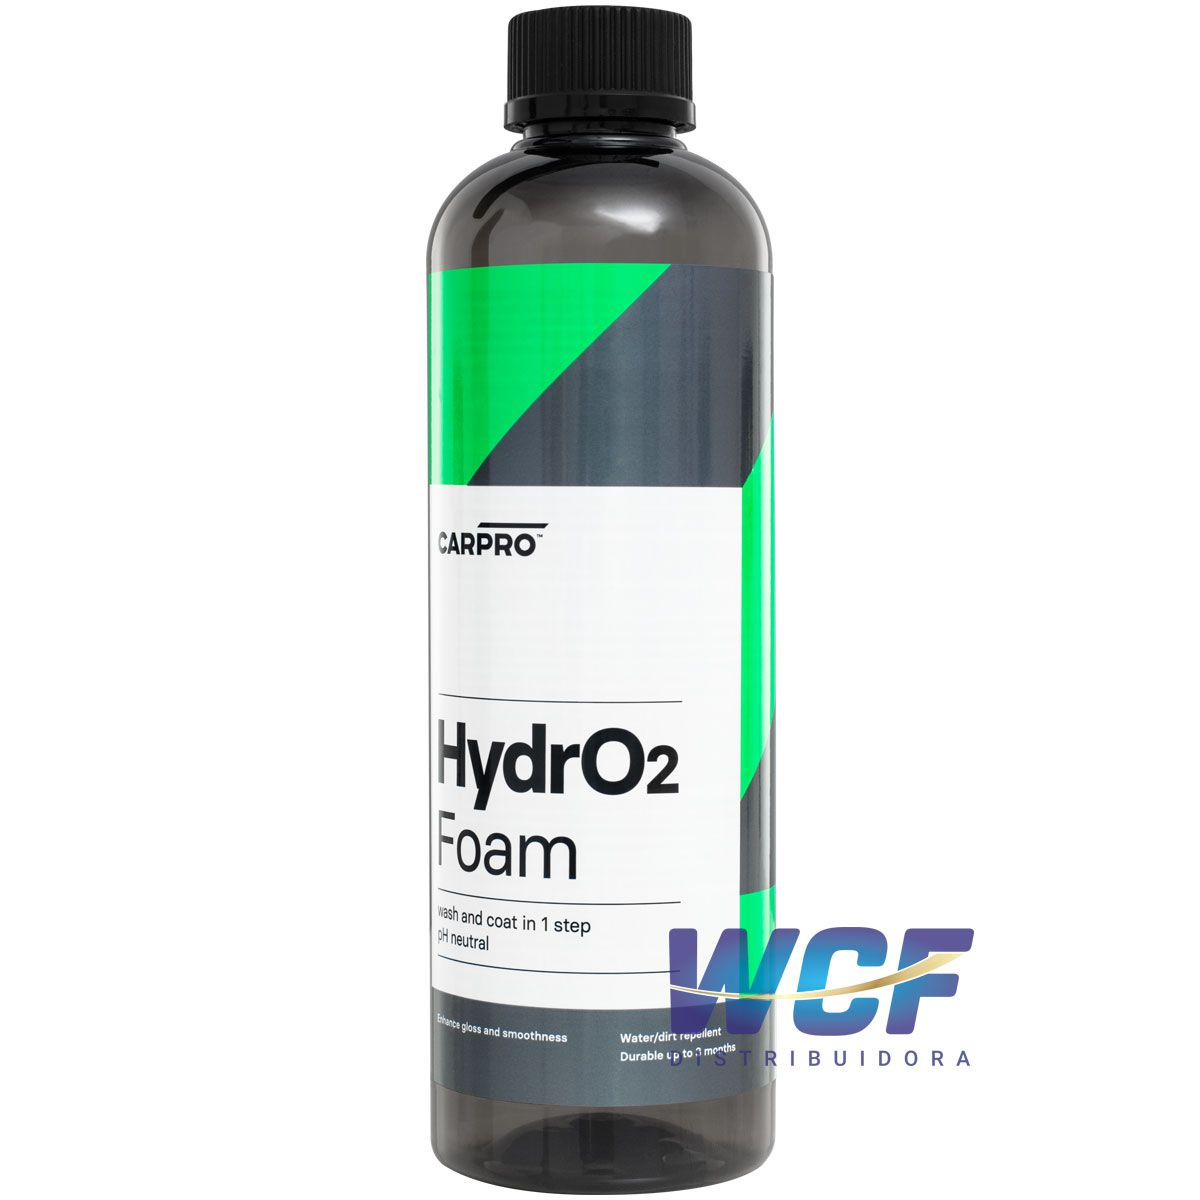 CARPRO HYDROFOAM SHAMPOO E SELANTE AUTOMOTIVO 500 ML